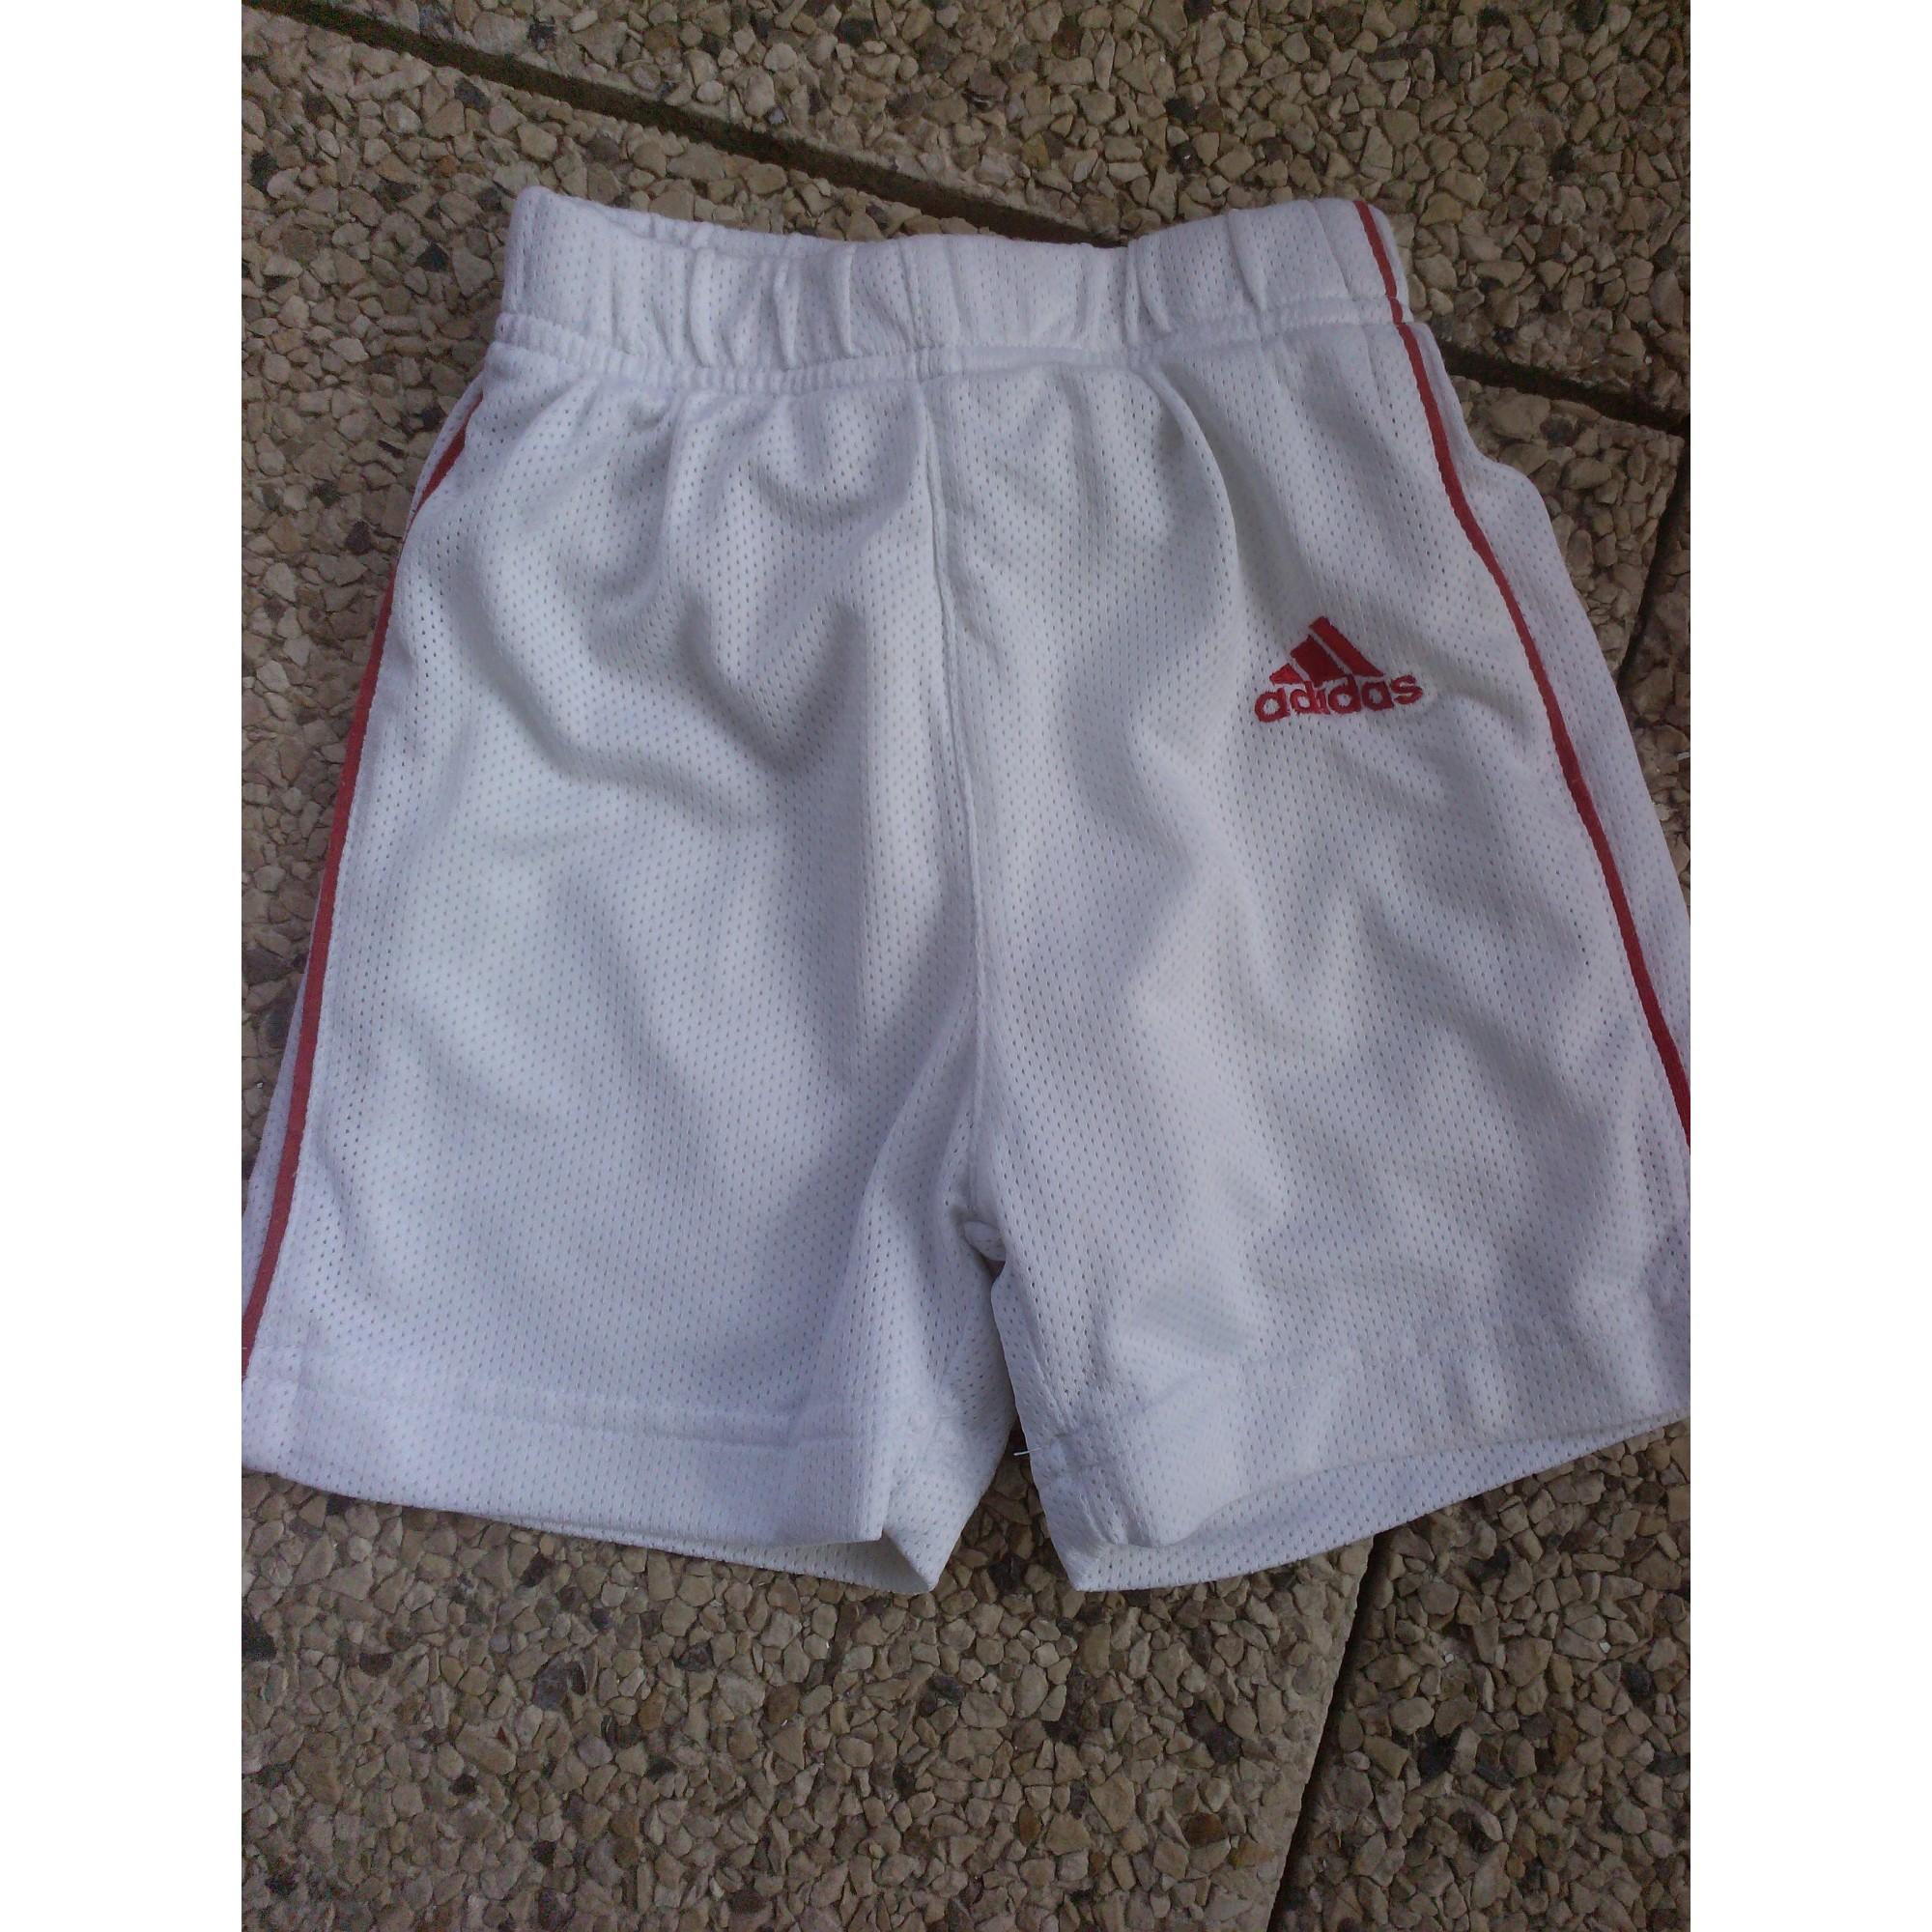 Shorts ADIDAS White, off-white, ecru